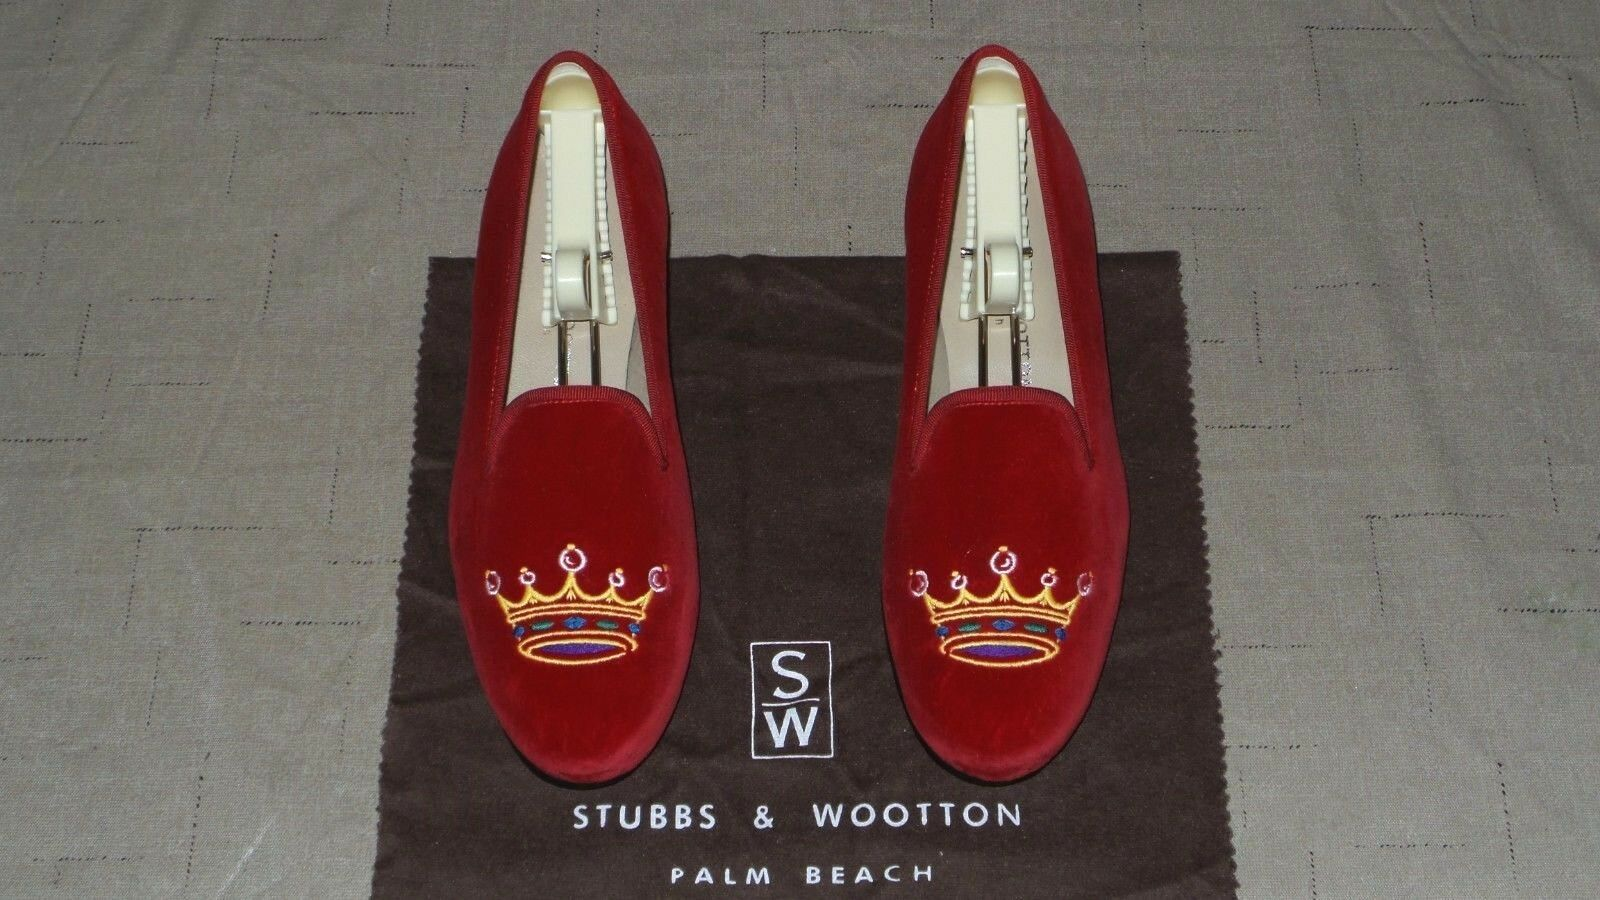 Tan lindo  Mujer  450 Stubbs and wootton wootton wootton Velvet  corona  Zapatillas Mocasines Zapatos  grandes ofertas